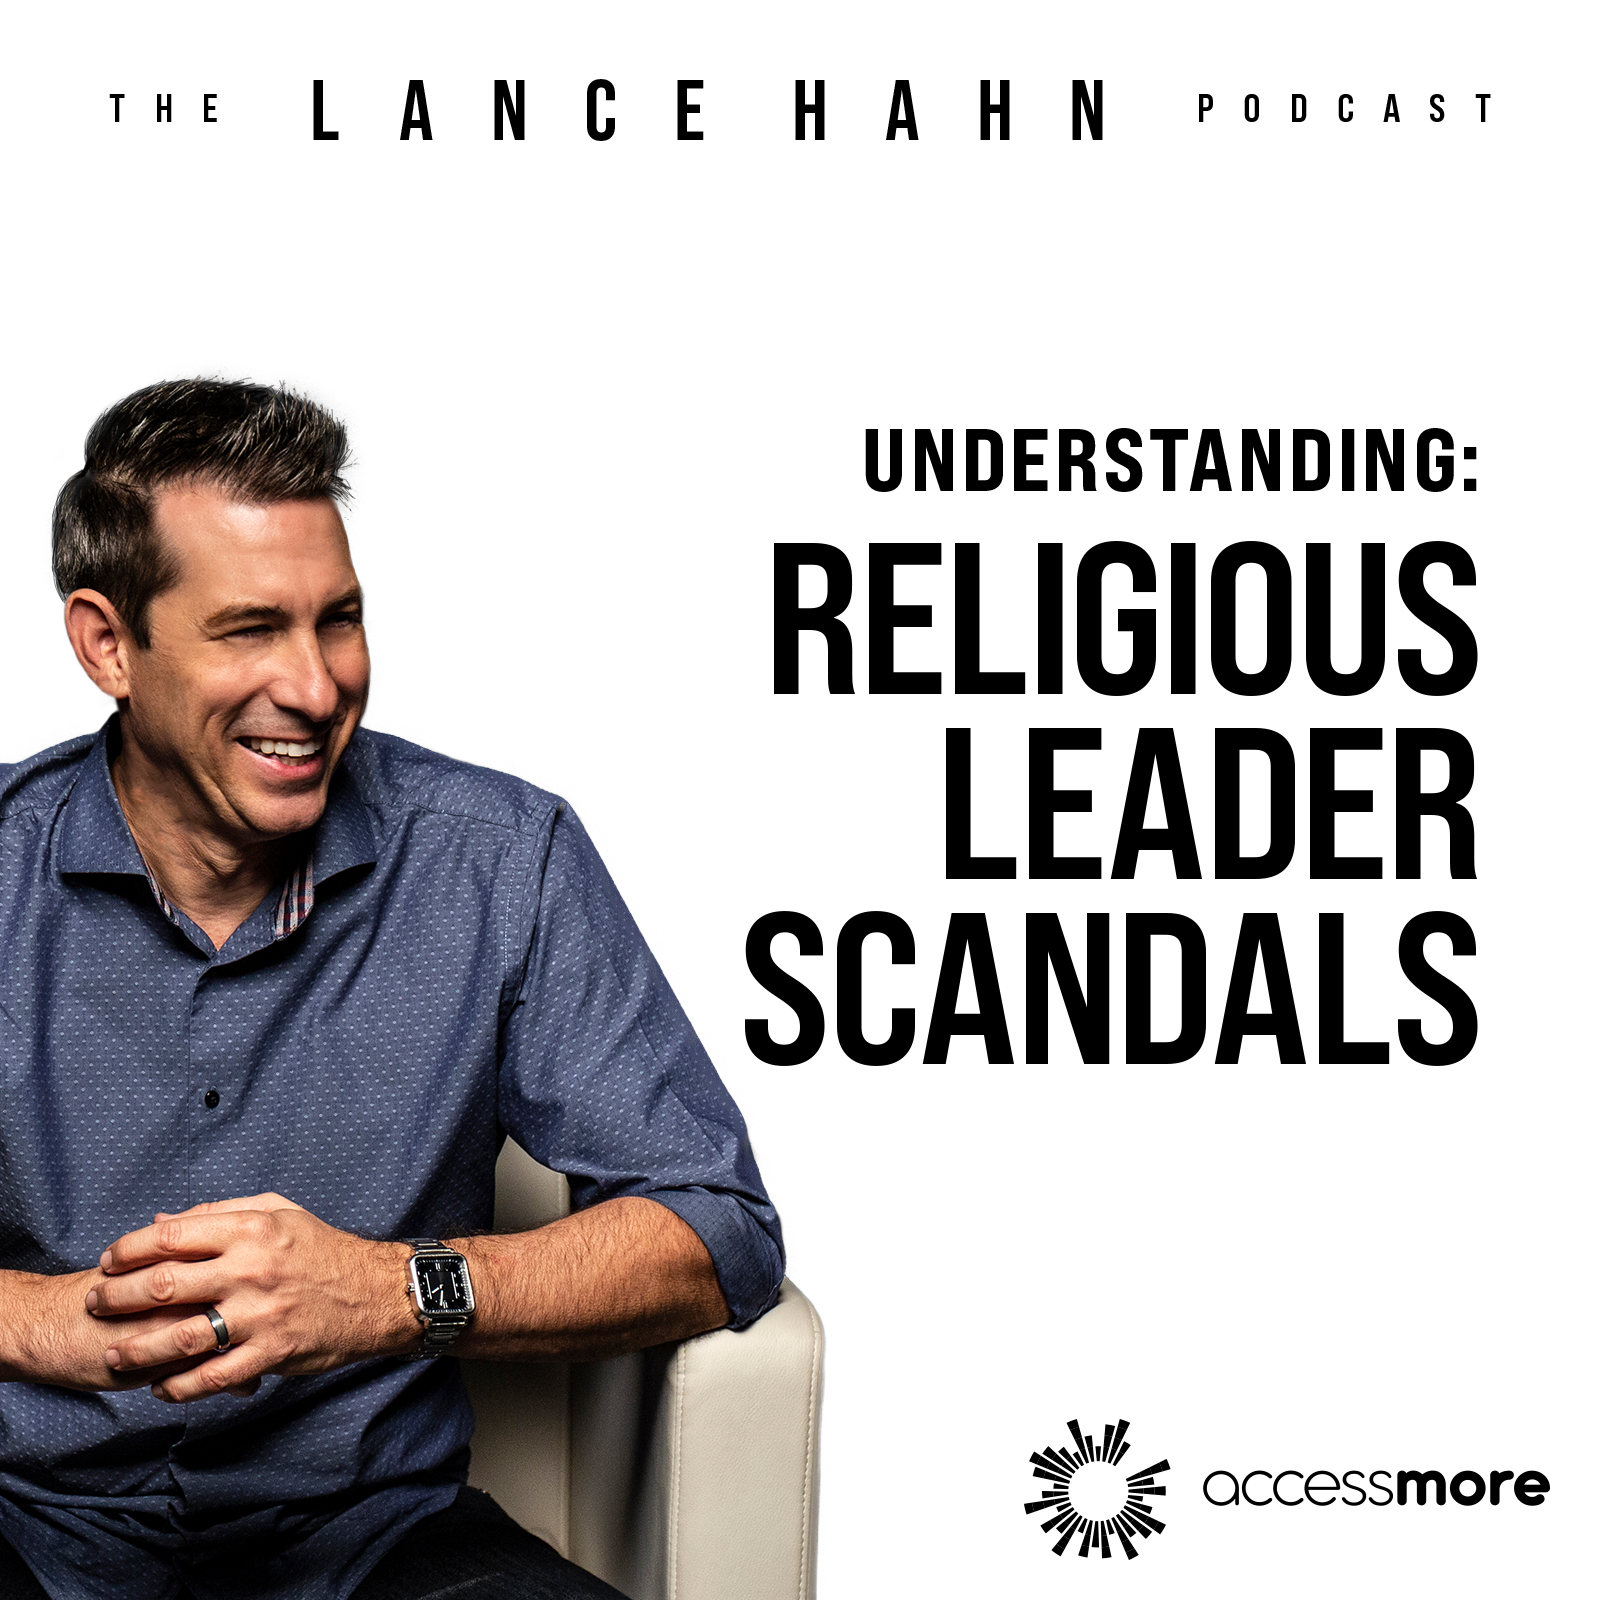 Ep 31: Understanding Religious Leader Scandals